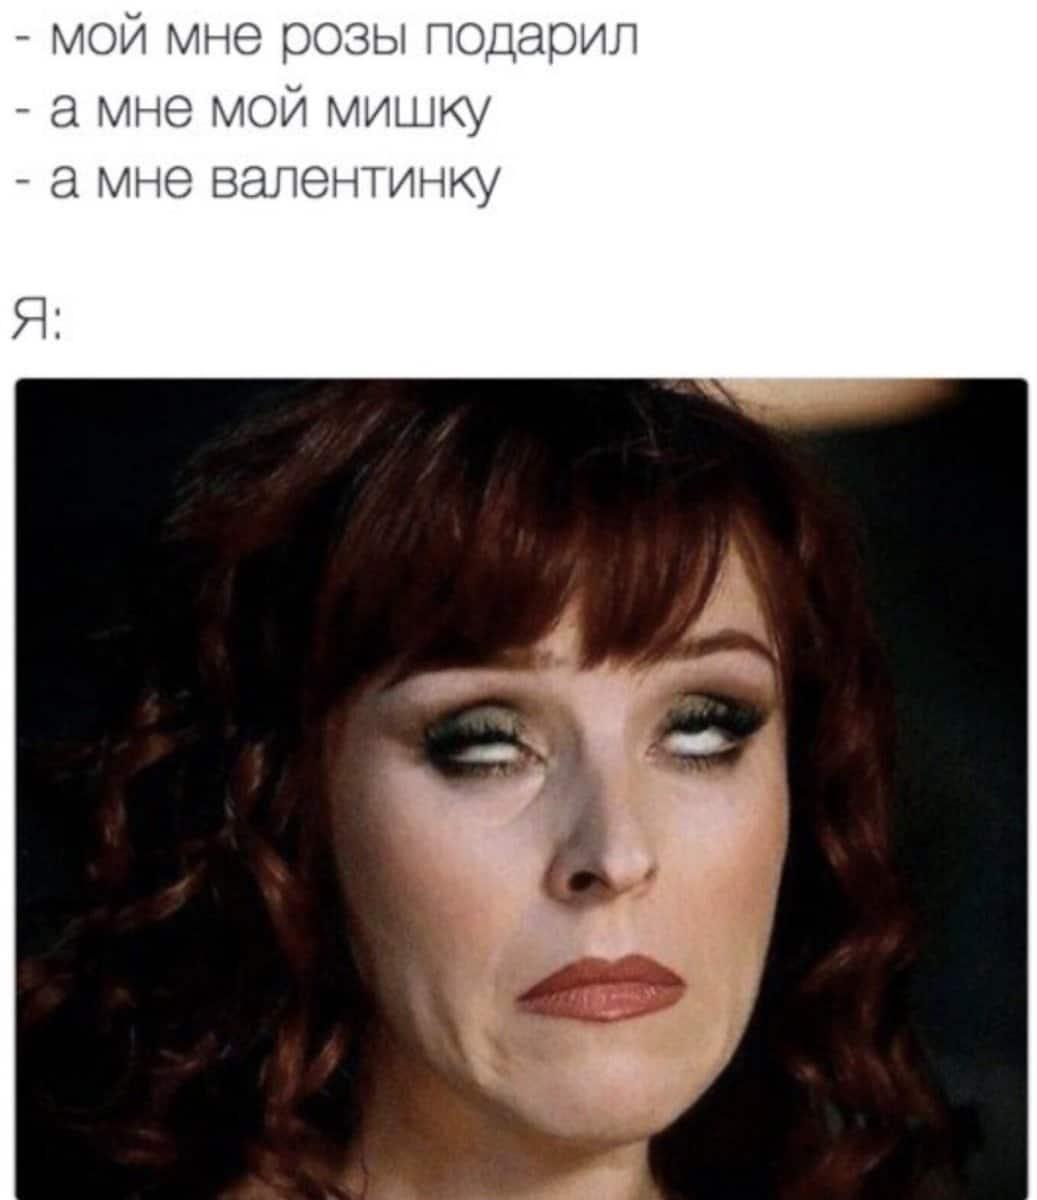 женщина закатывает глаза мем